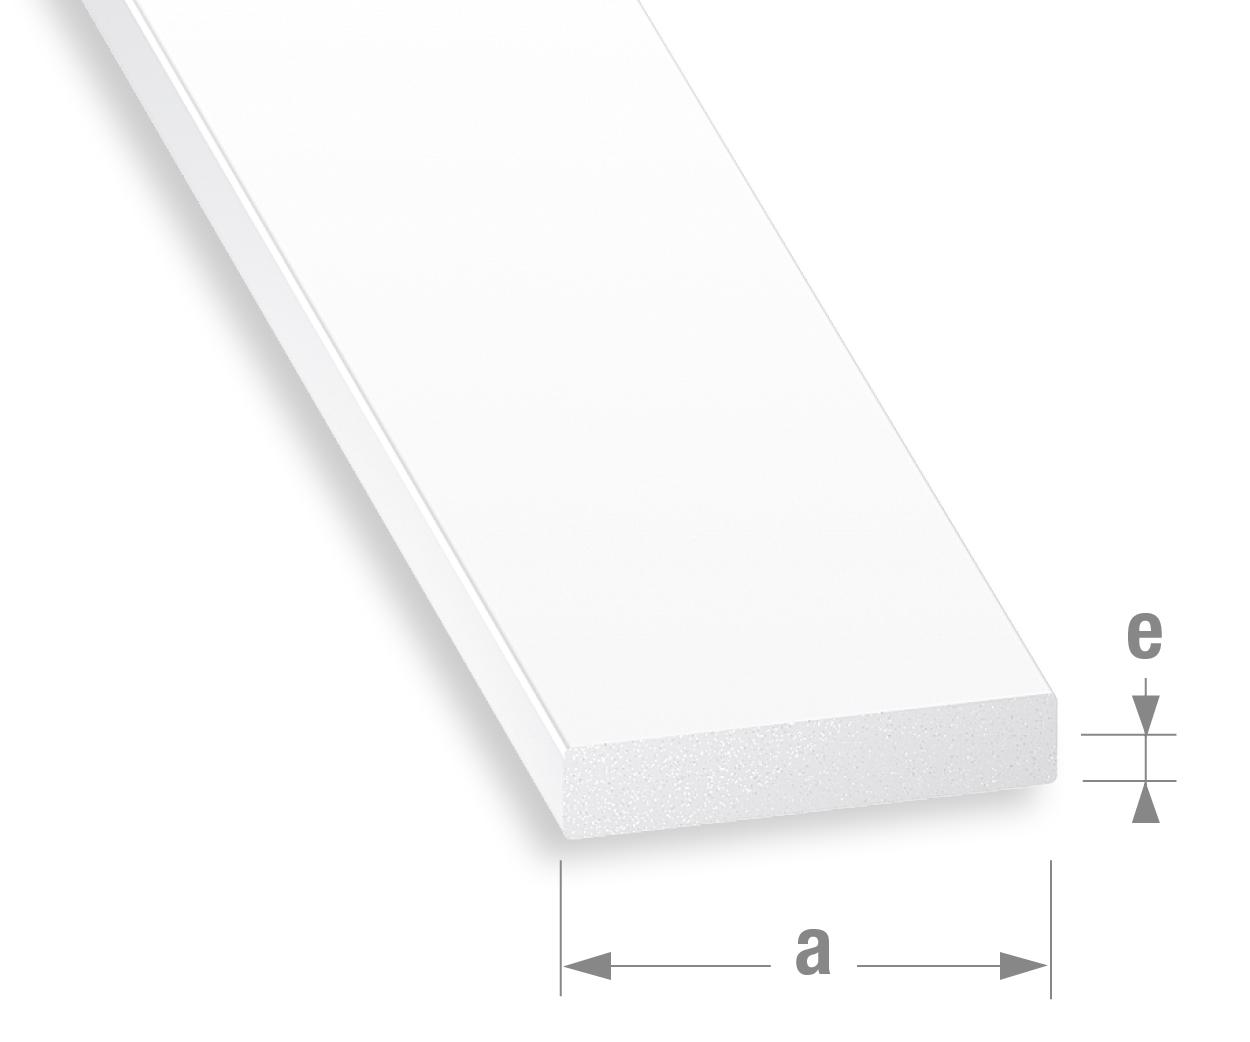 abschlussprofile platten grobe groben pvc flachstange weiss. Black Bedroom Furniture Sets. Home Design Ideas